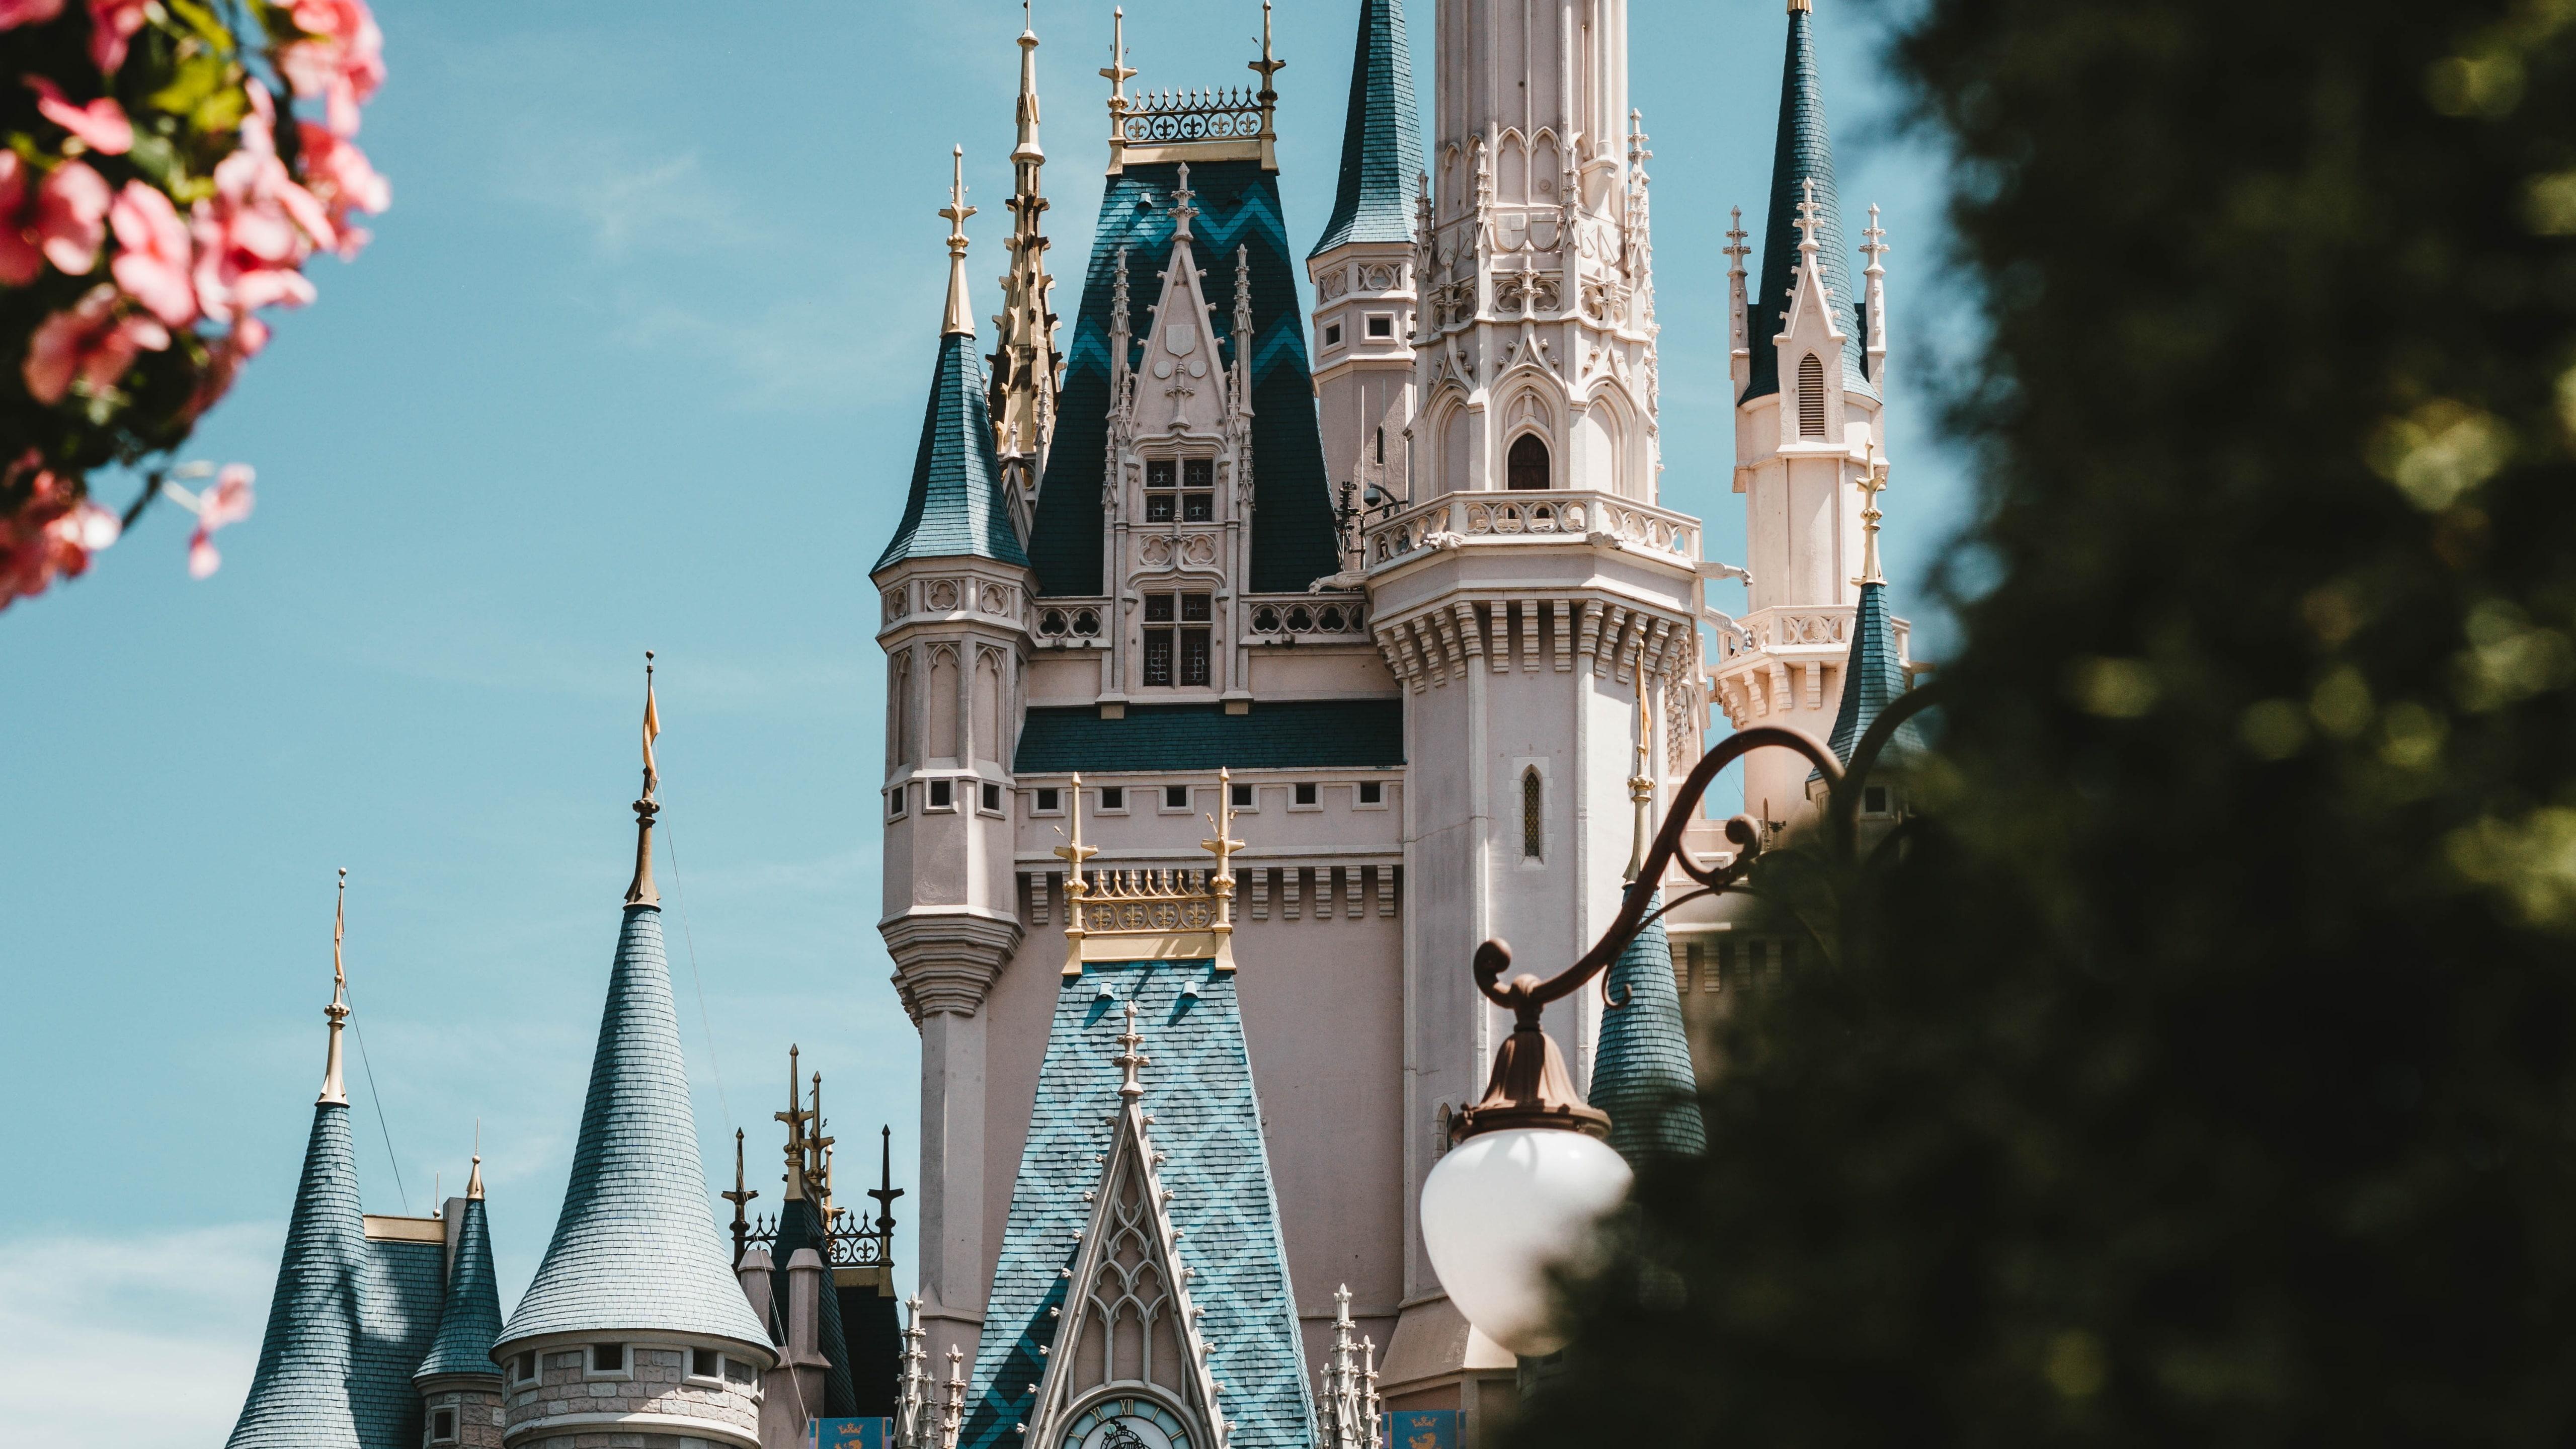 Theme Park Recreation Architecture America United Walt